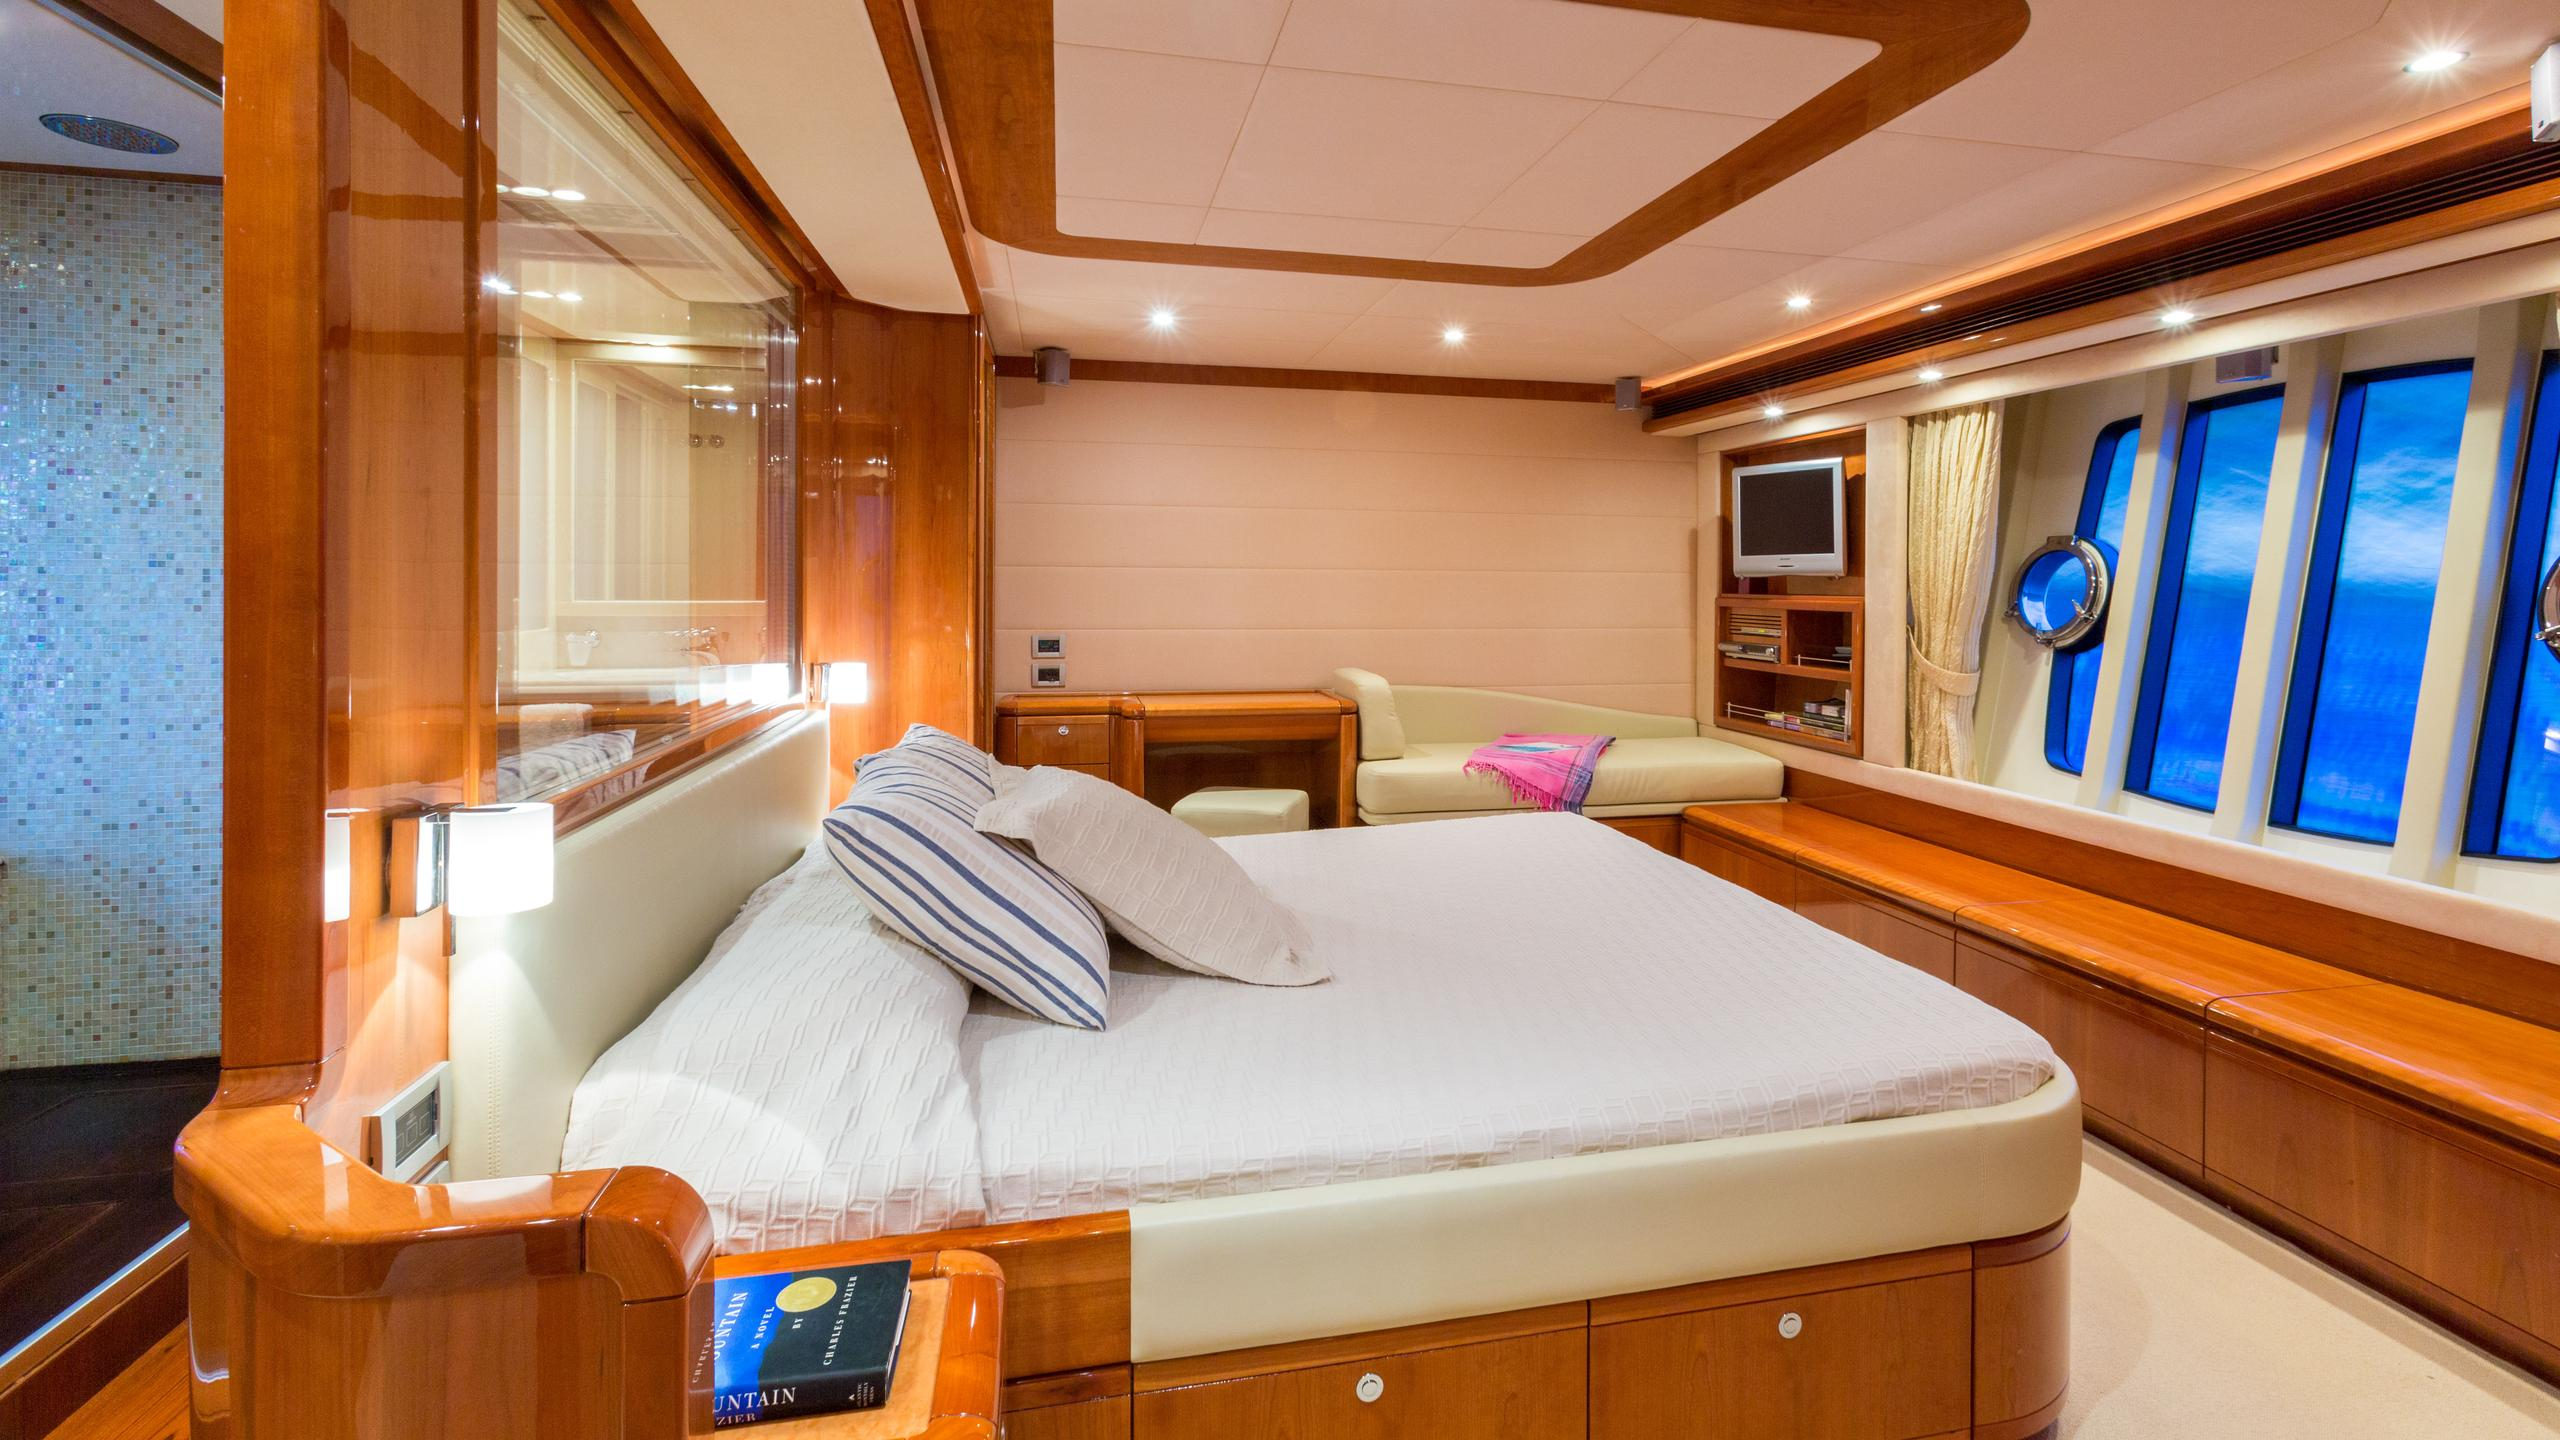 monticello-ii-yacht-master-cabin